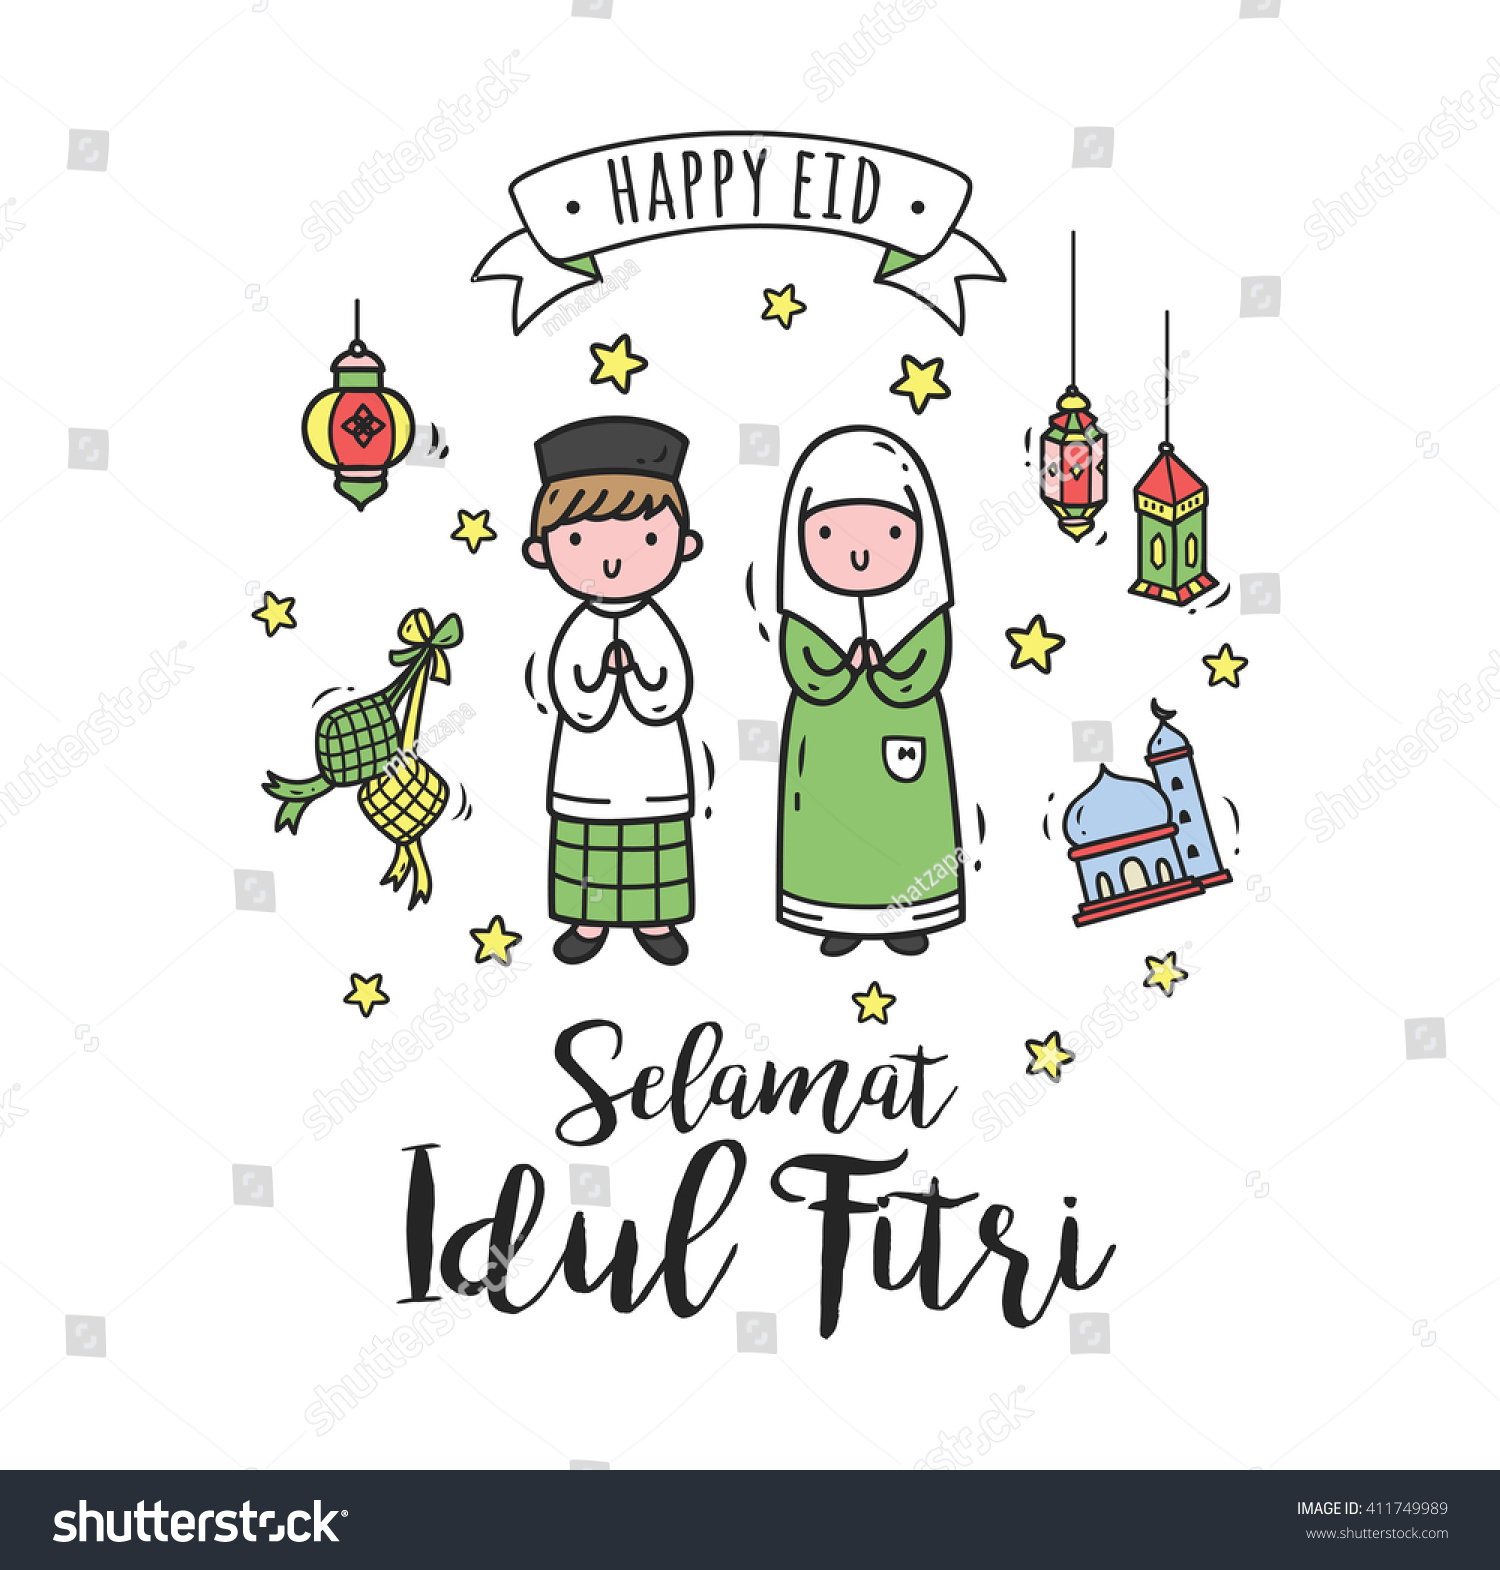 Eid Mubarak Idul Fitri Greeting Card Stock Vector 411749989